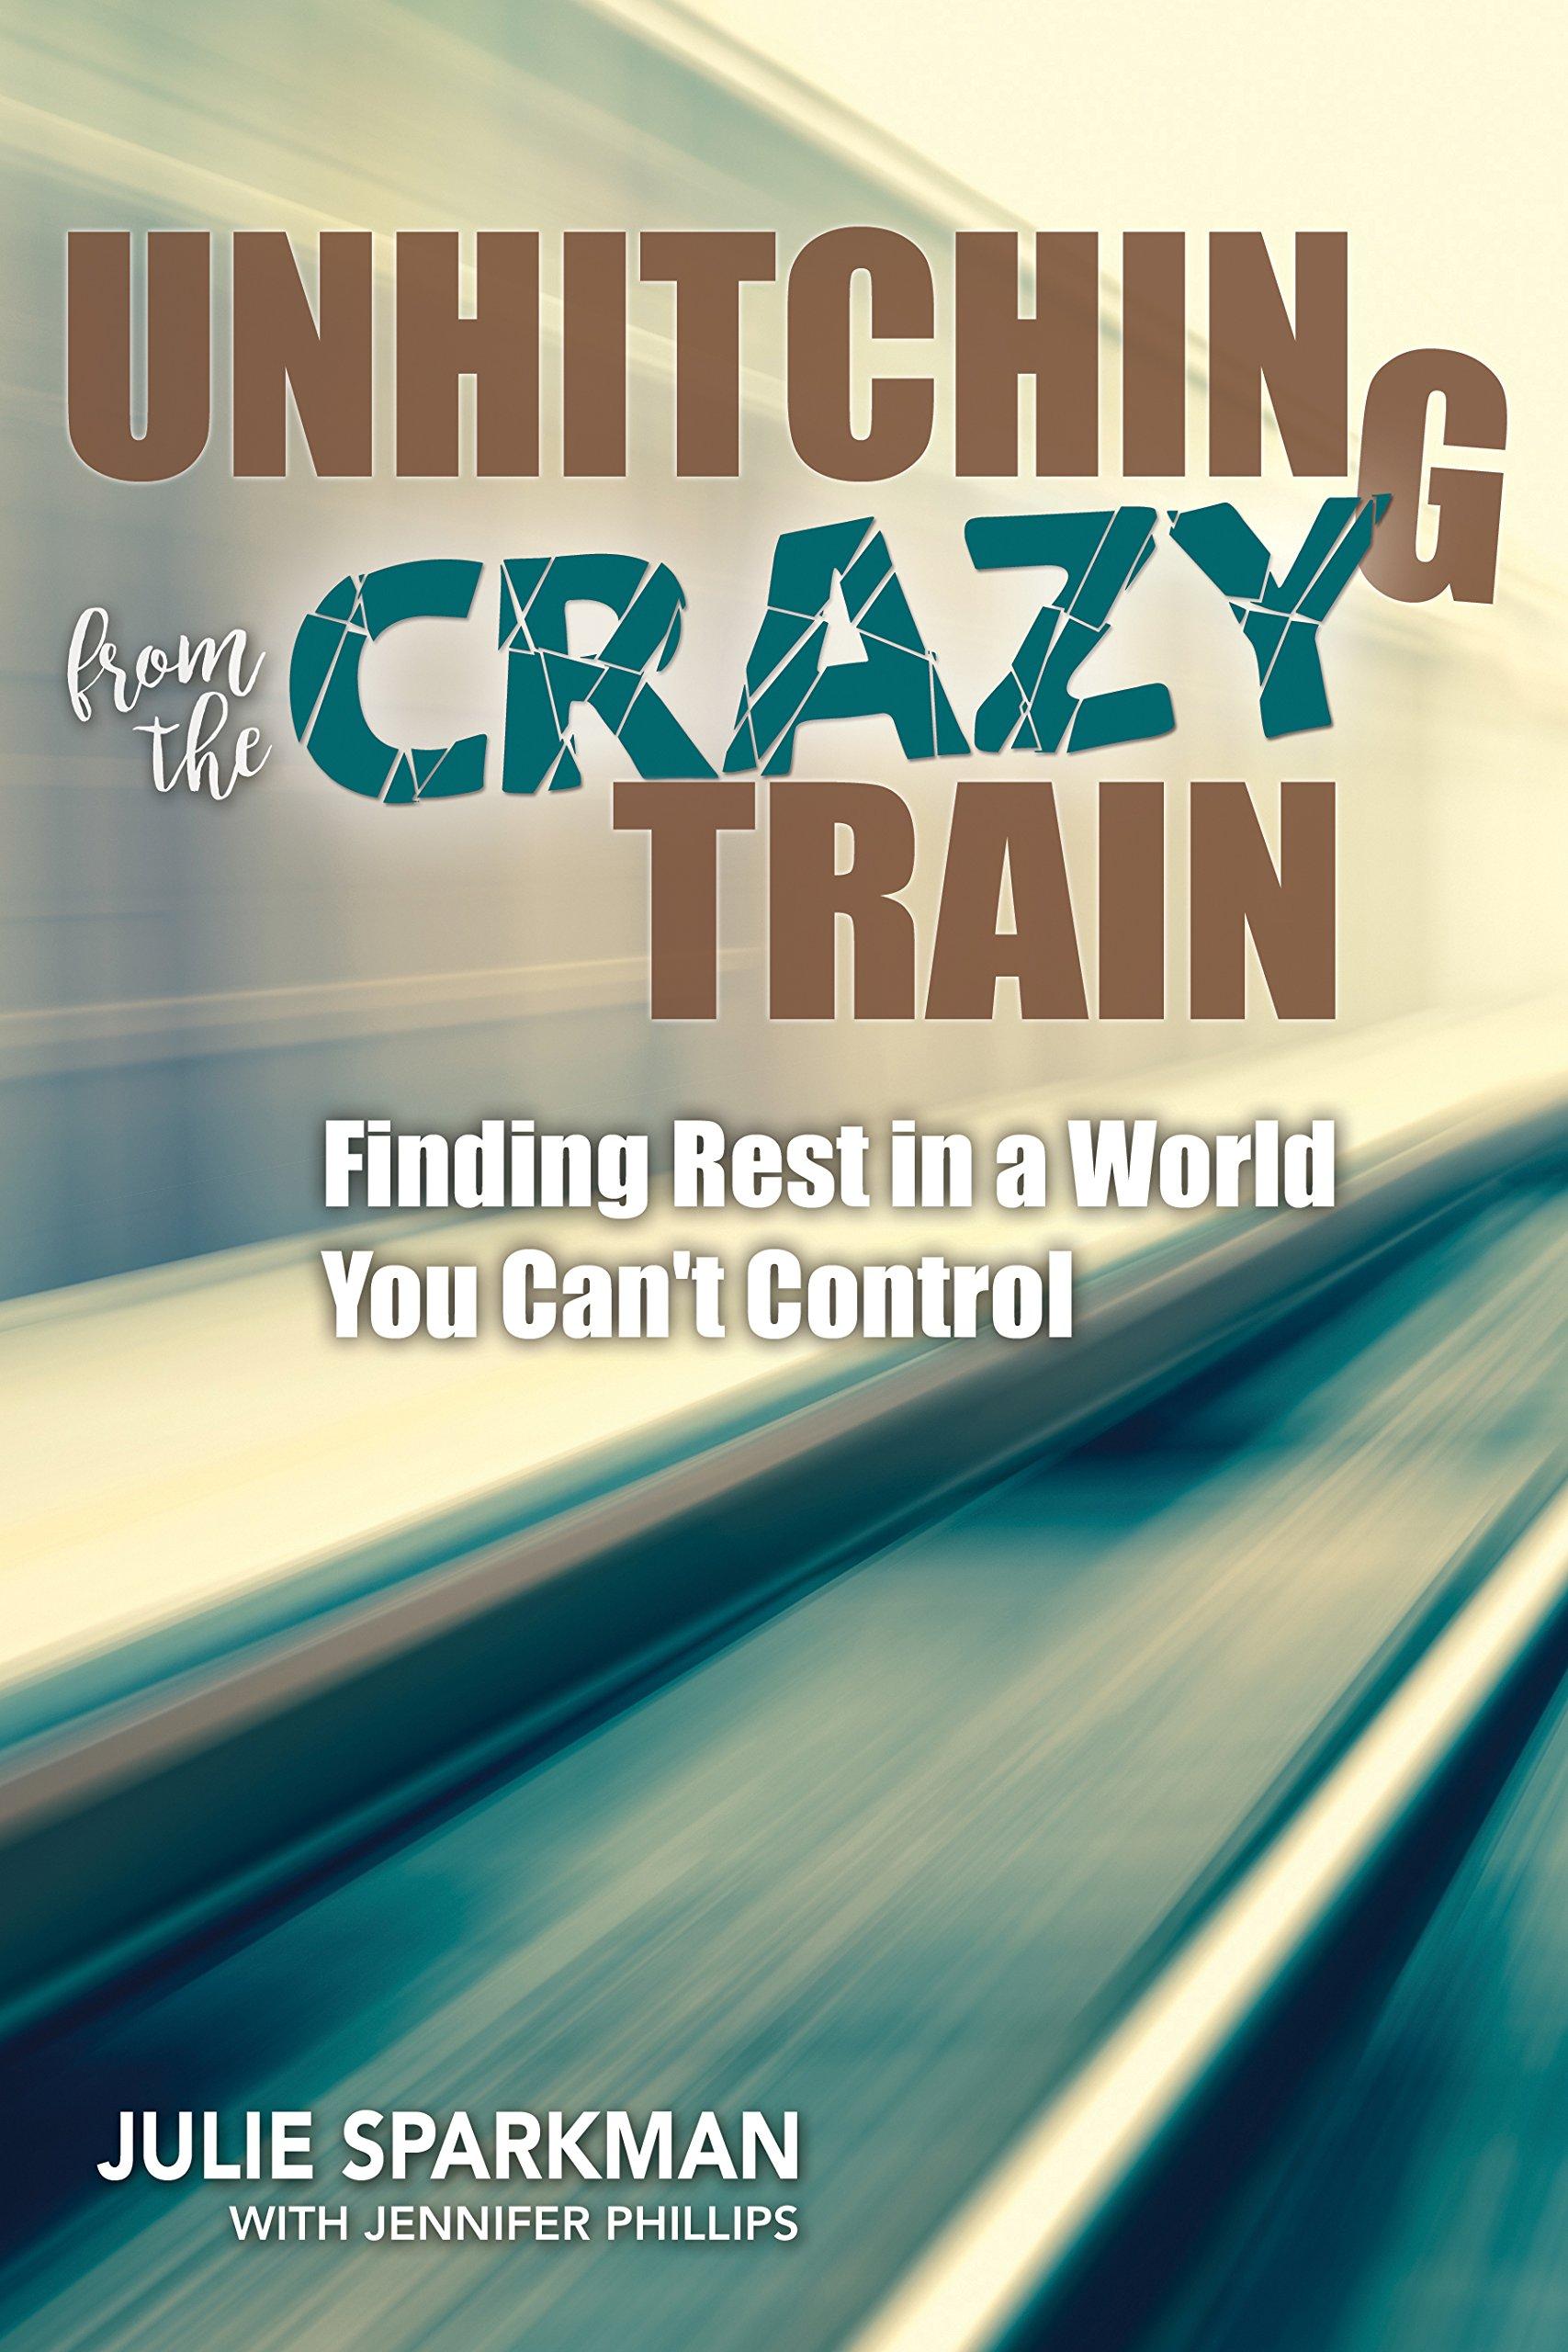 Crazy train live mp3 download